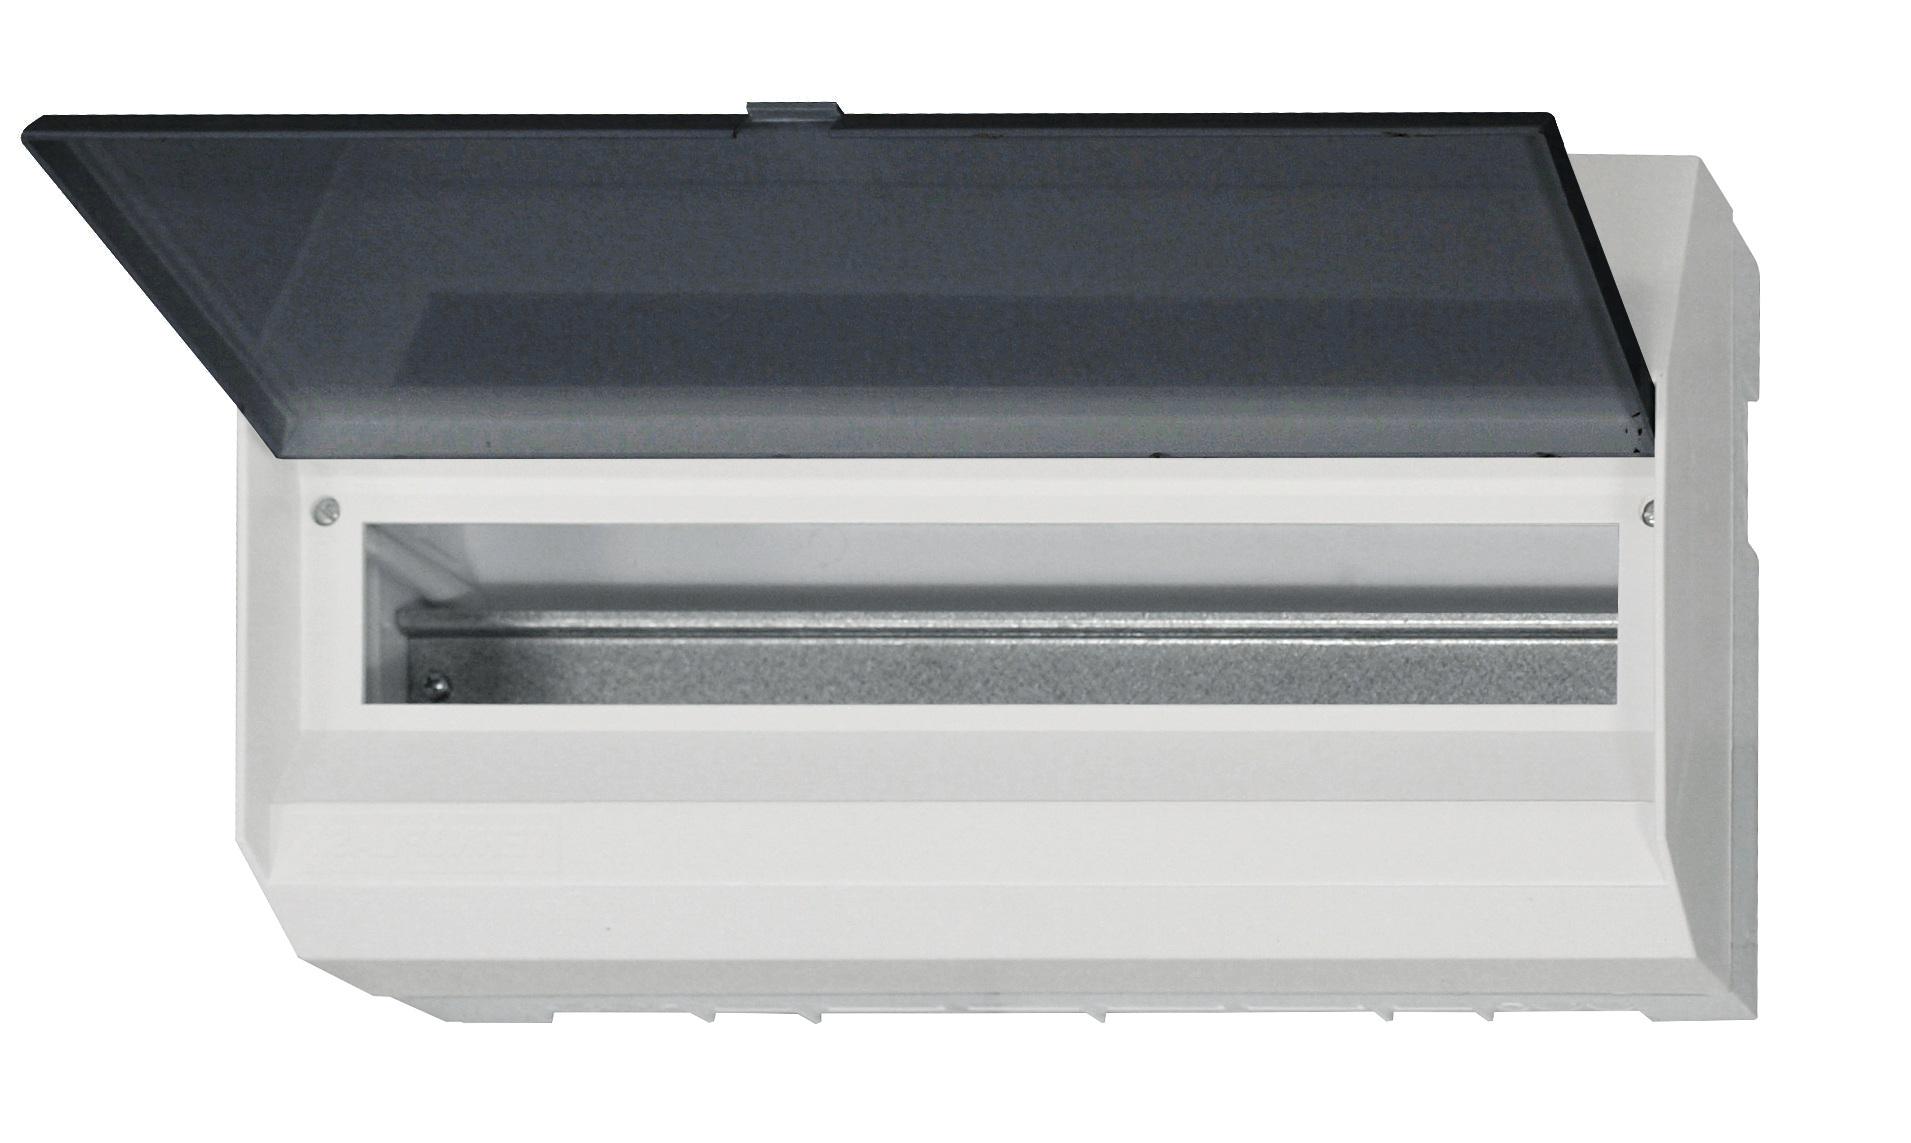 1 Stk AP-Wohnungsverteiler 1-reihig, 18TE, transparente Tür BK080121--